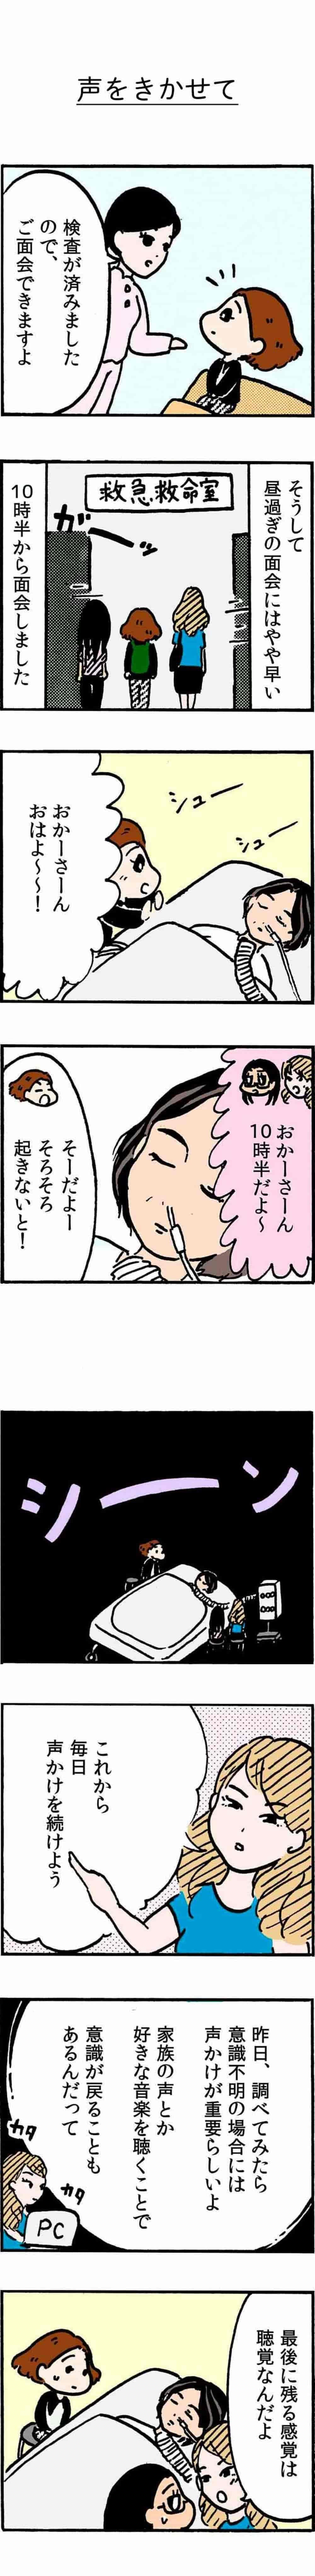 6dai5wa-min